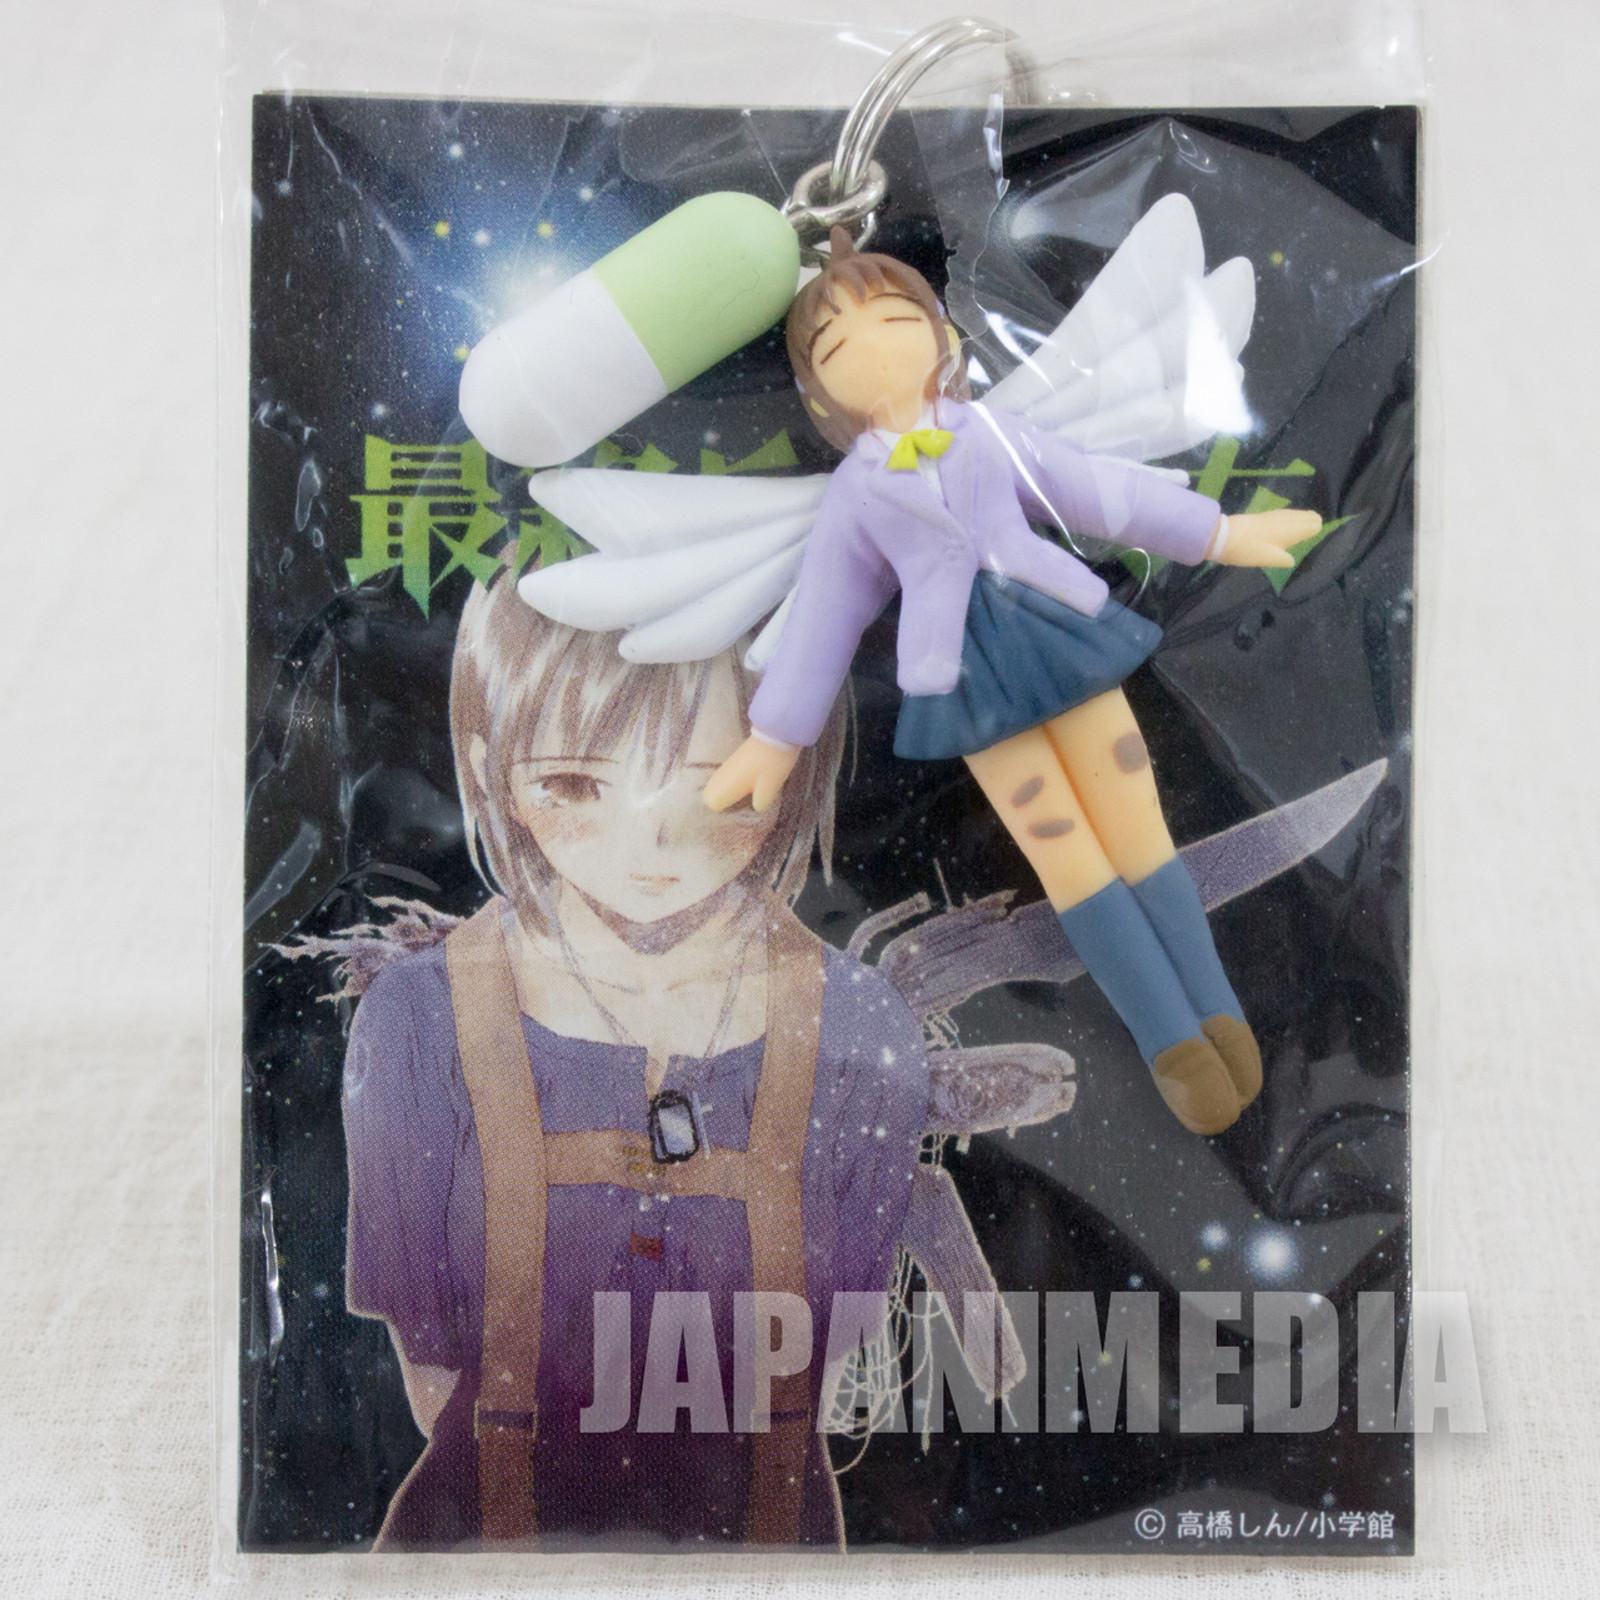 Saikano Saisyu Heiki Kanojo Chise #3 Figure Key Chain JAPAN ANIME MANGA